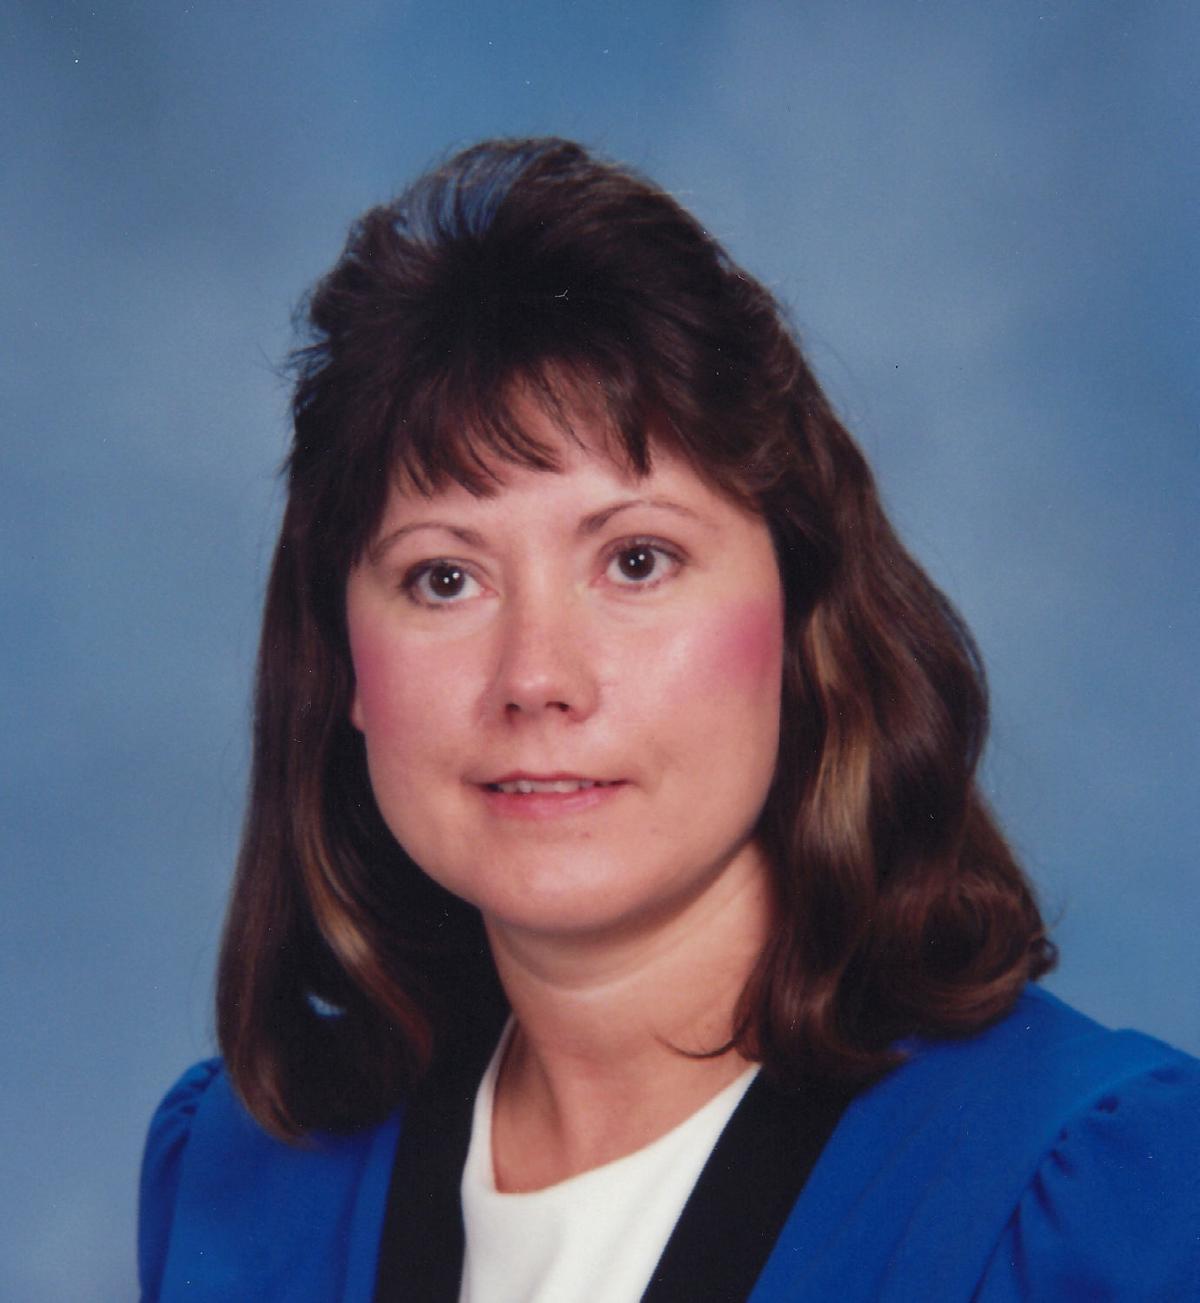 Jeanna Gail Balch